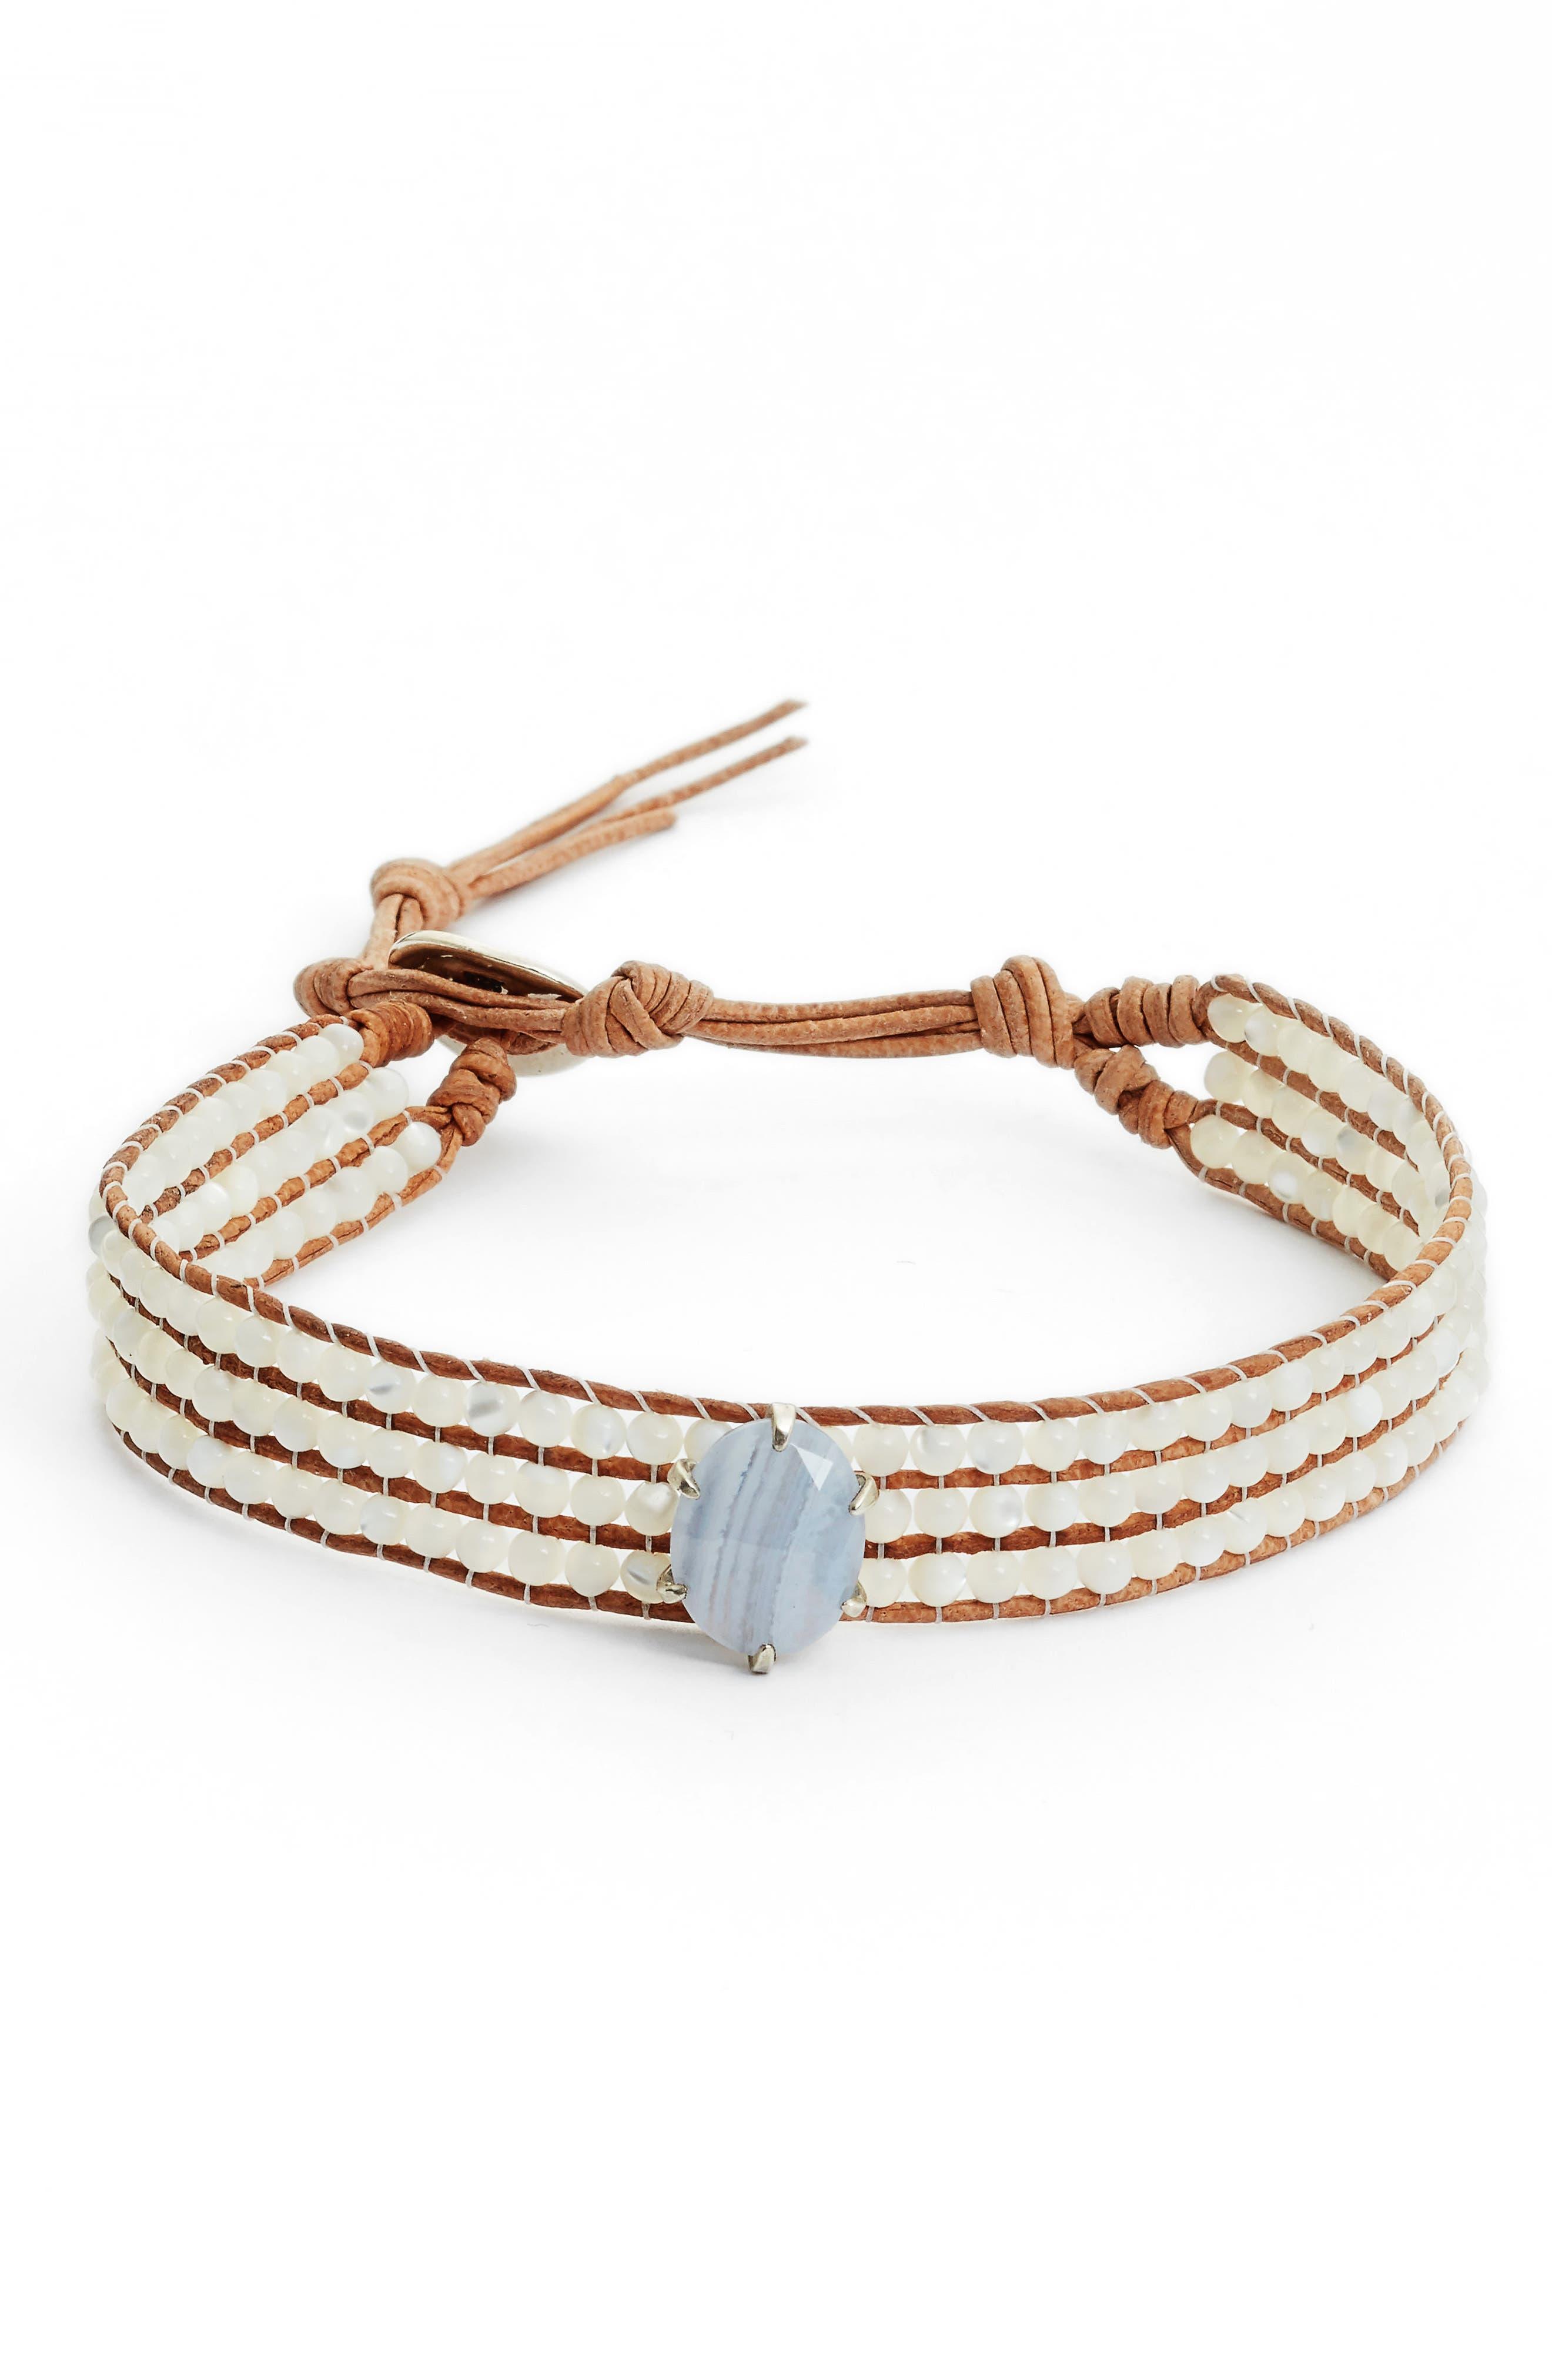 Semiprecious Stone Statement Bracelet,                         Main,                         color, WHITE MOP MIX